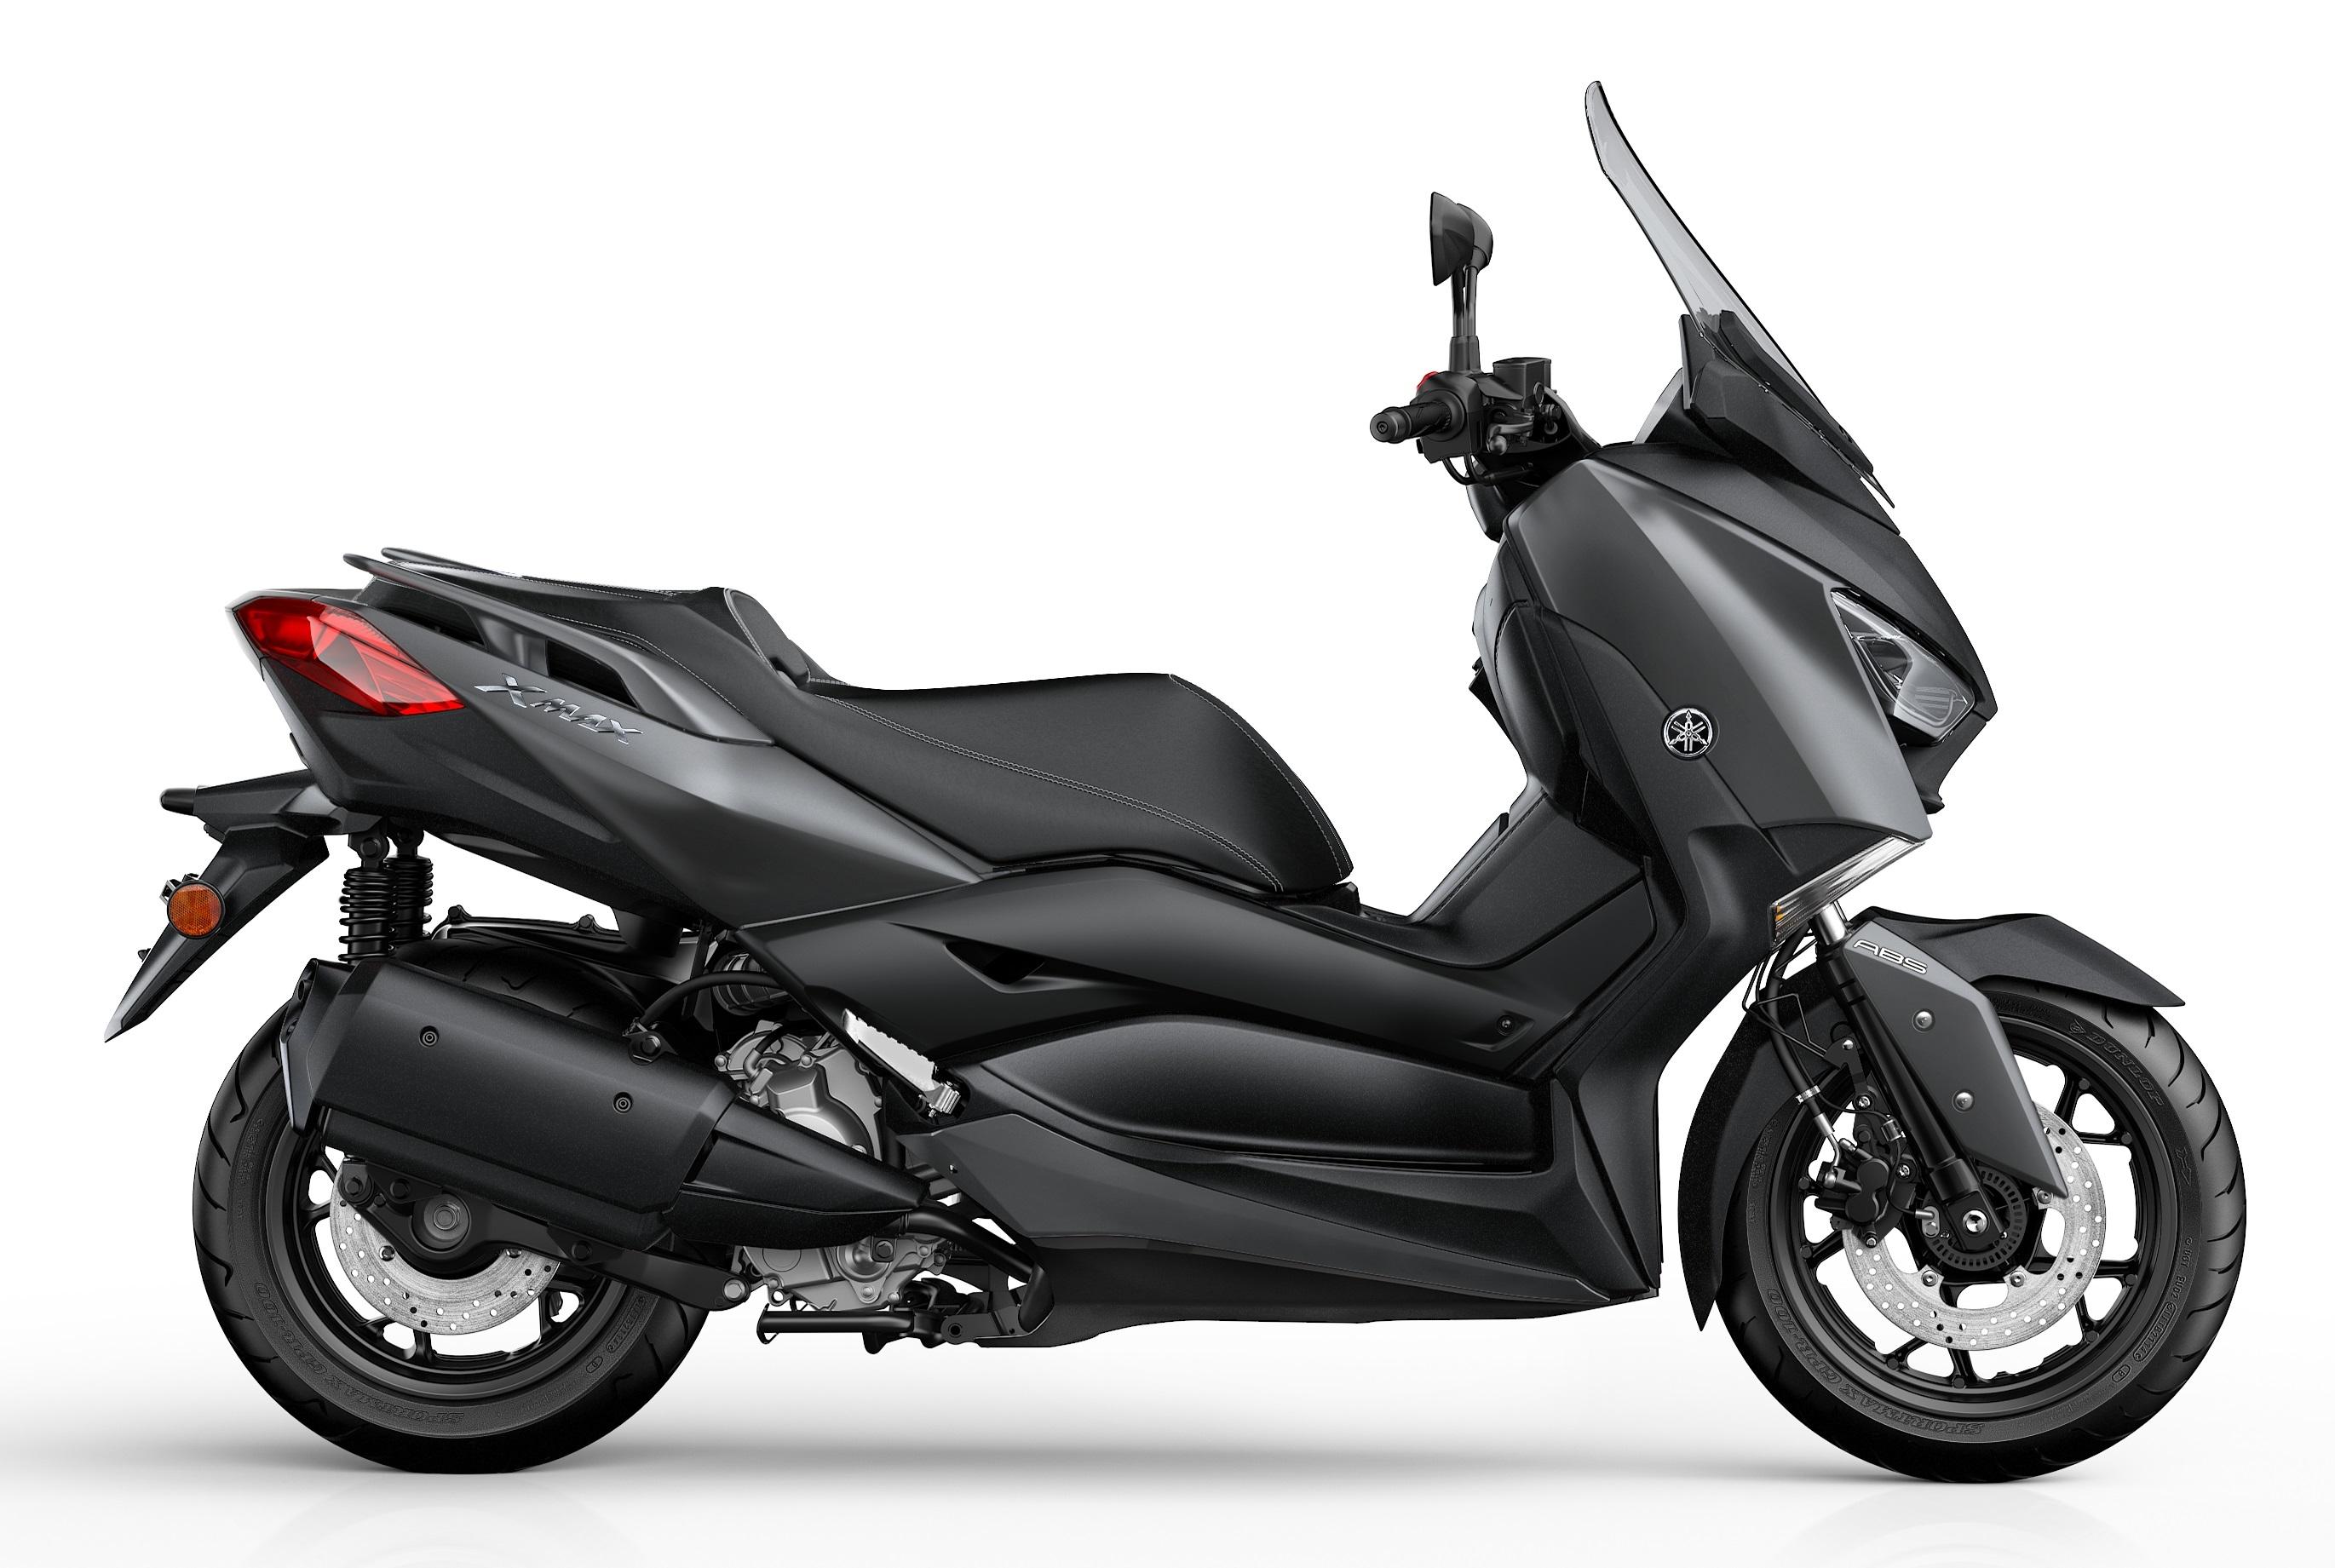 For Sale: Yamaha X-MAX 300 • The Bike Market